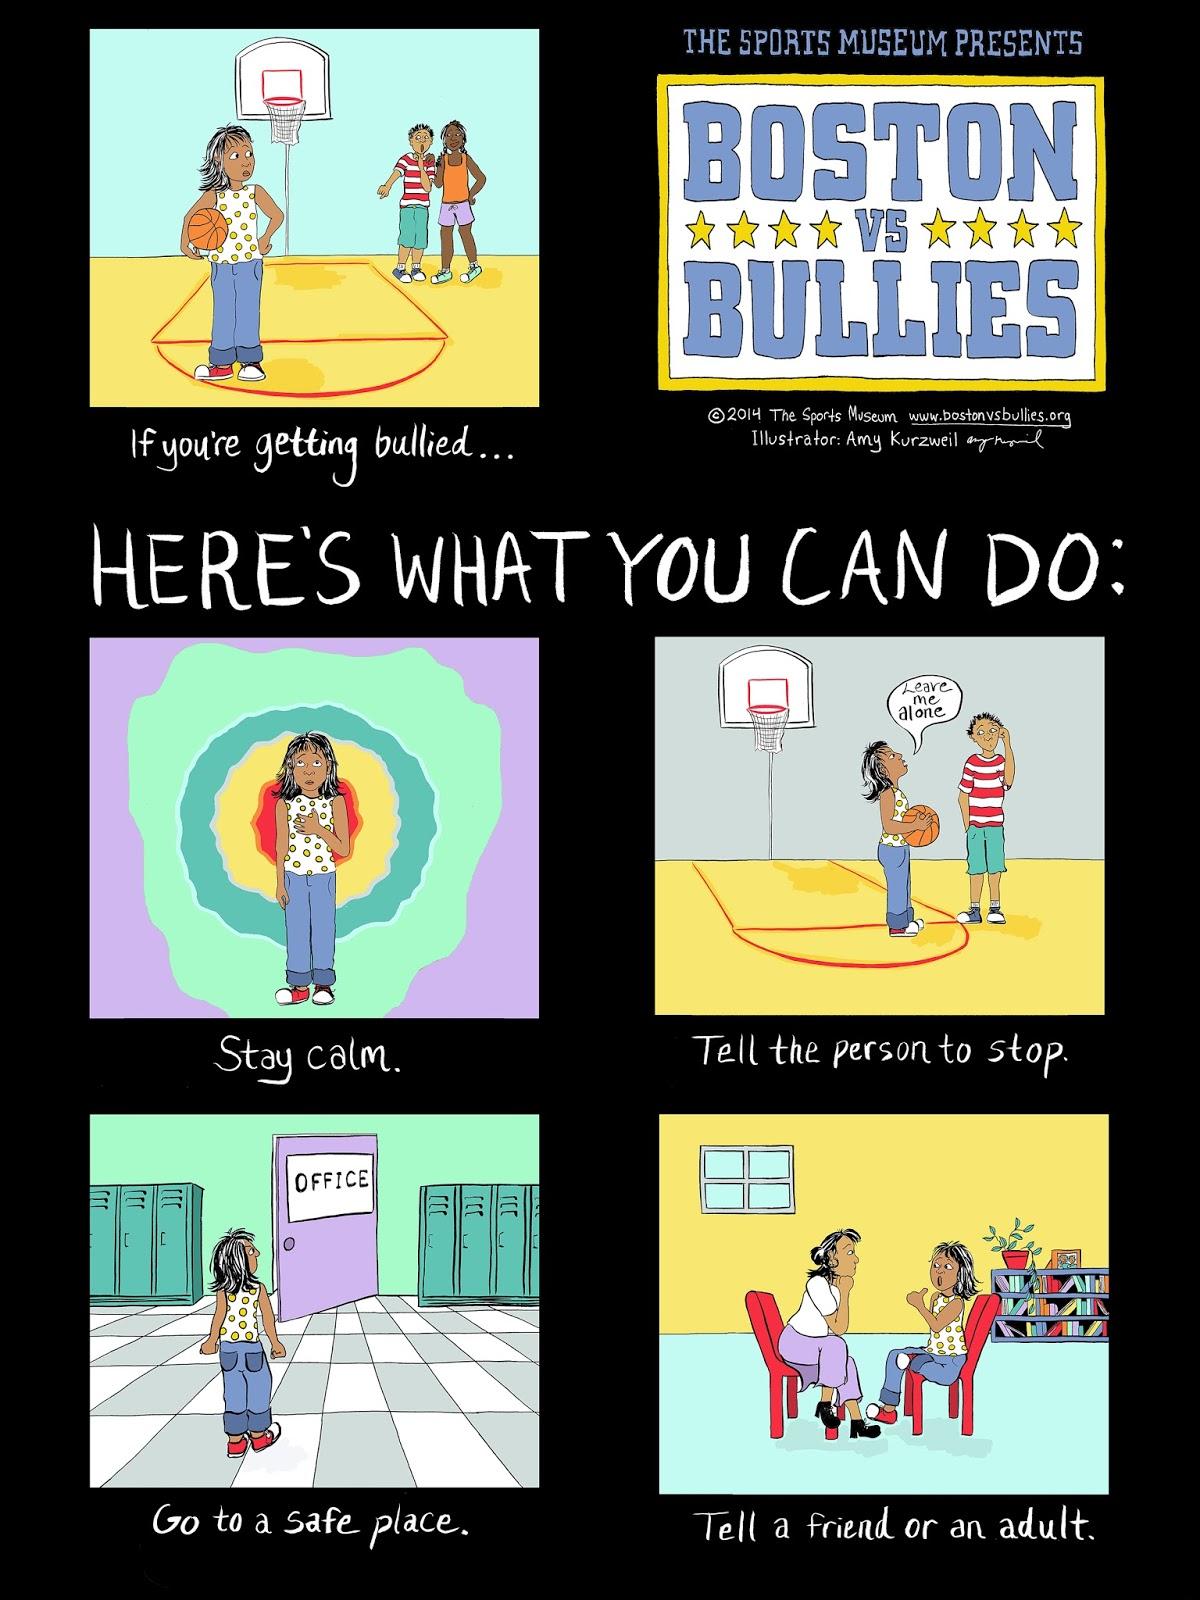 Cgs Guidance Blog New Anti Bullying Curriculum For Cgs